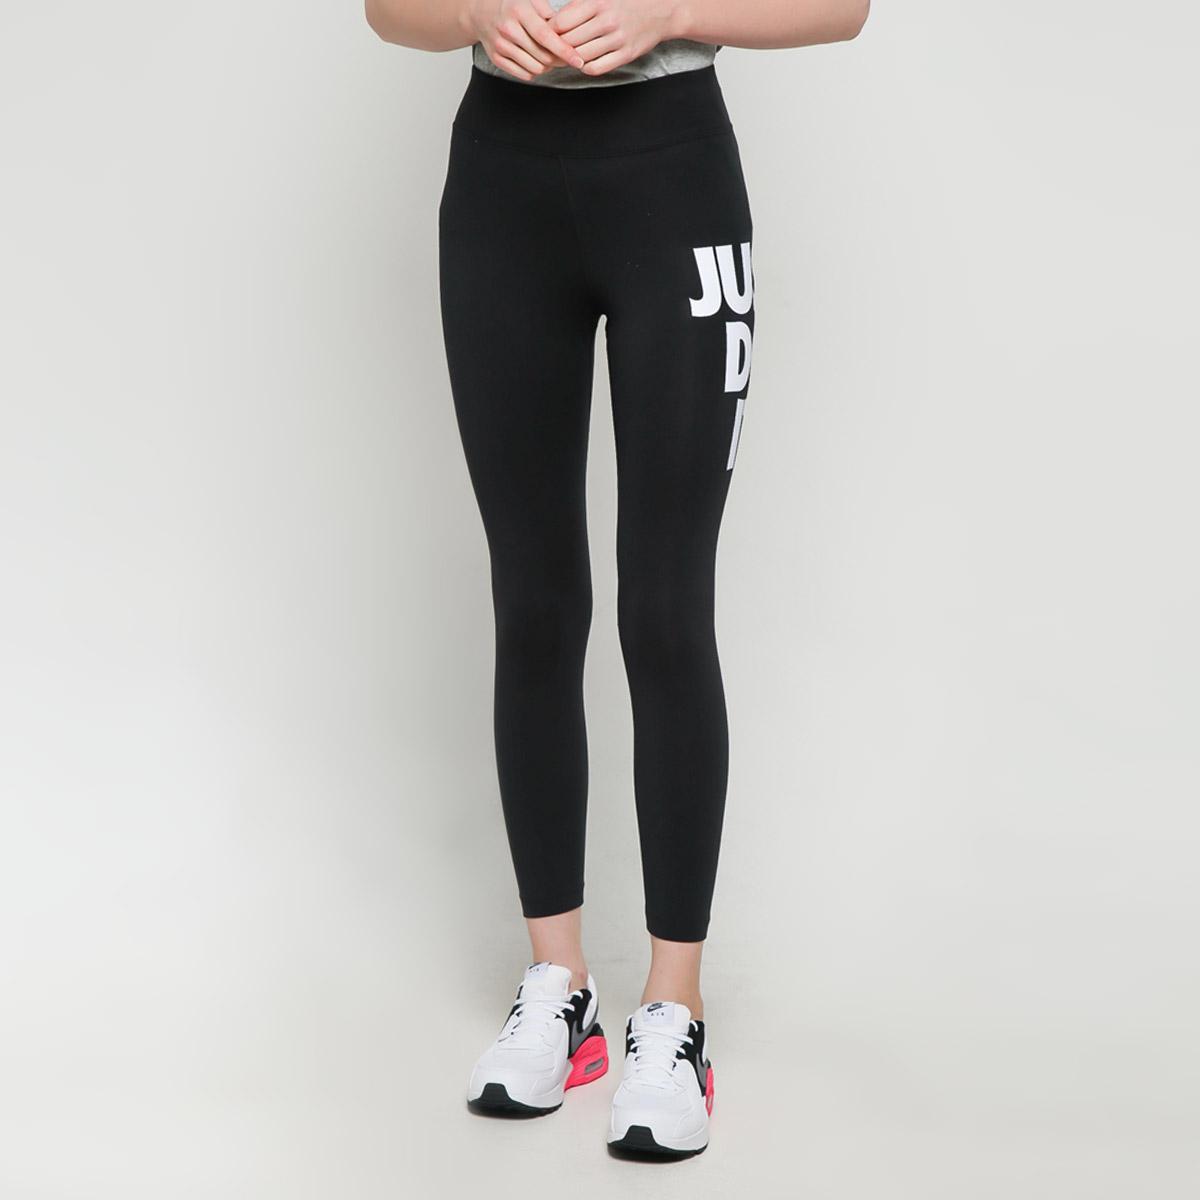 Jual Nike Women Sportswear Legasee Legging 7 8 Hi West Just Do It Celana Olahraga Wanita Cj2658 011 Online Oktober 2020 Blibli Com